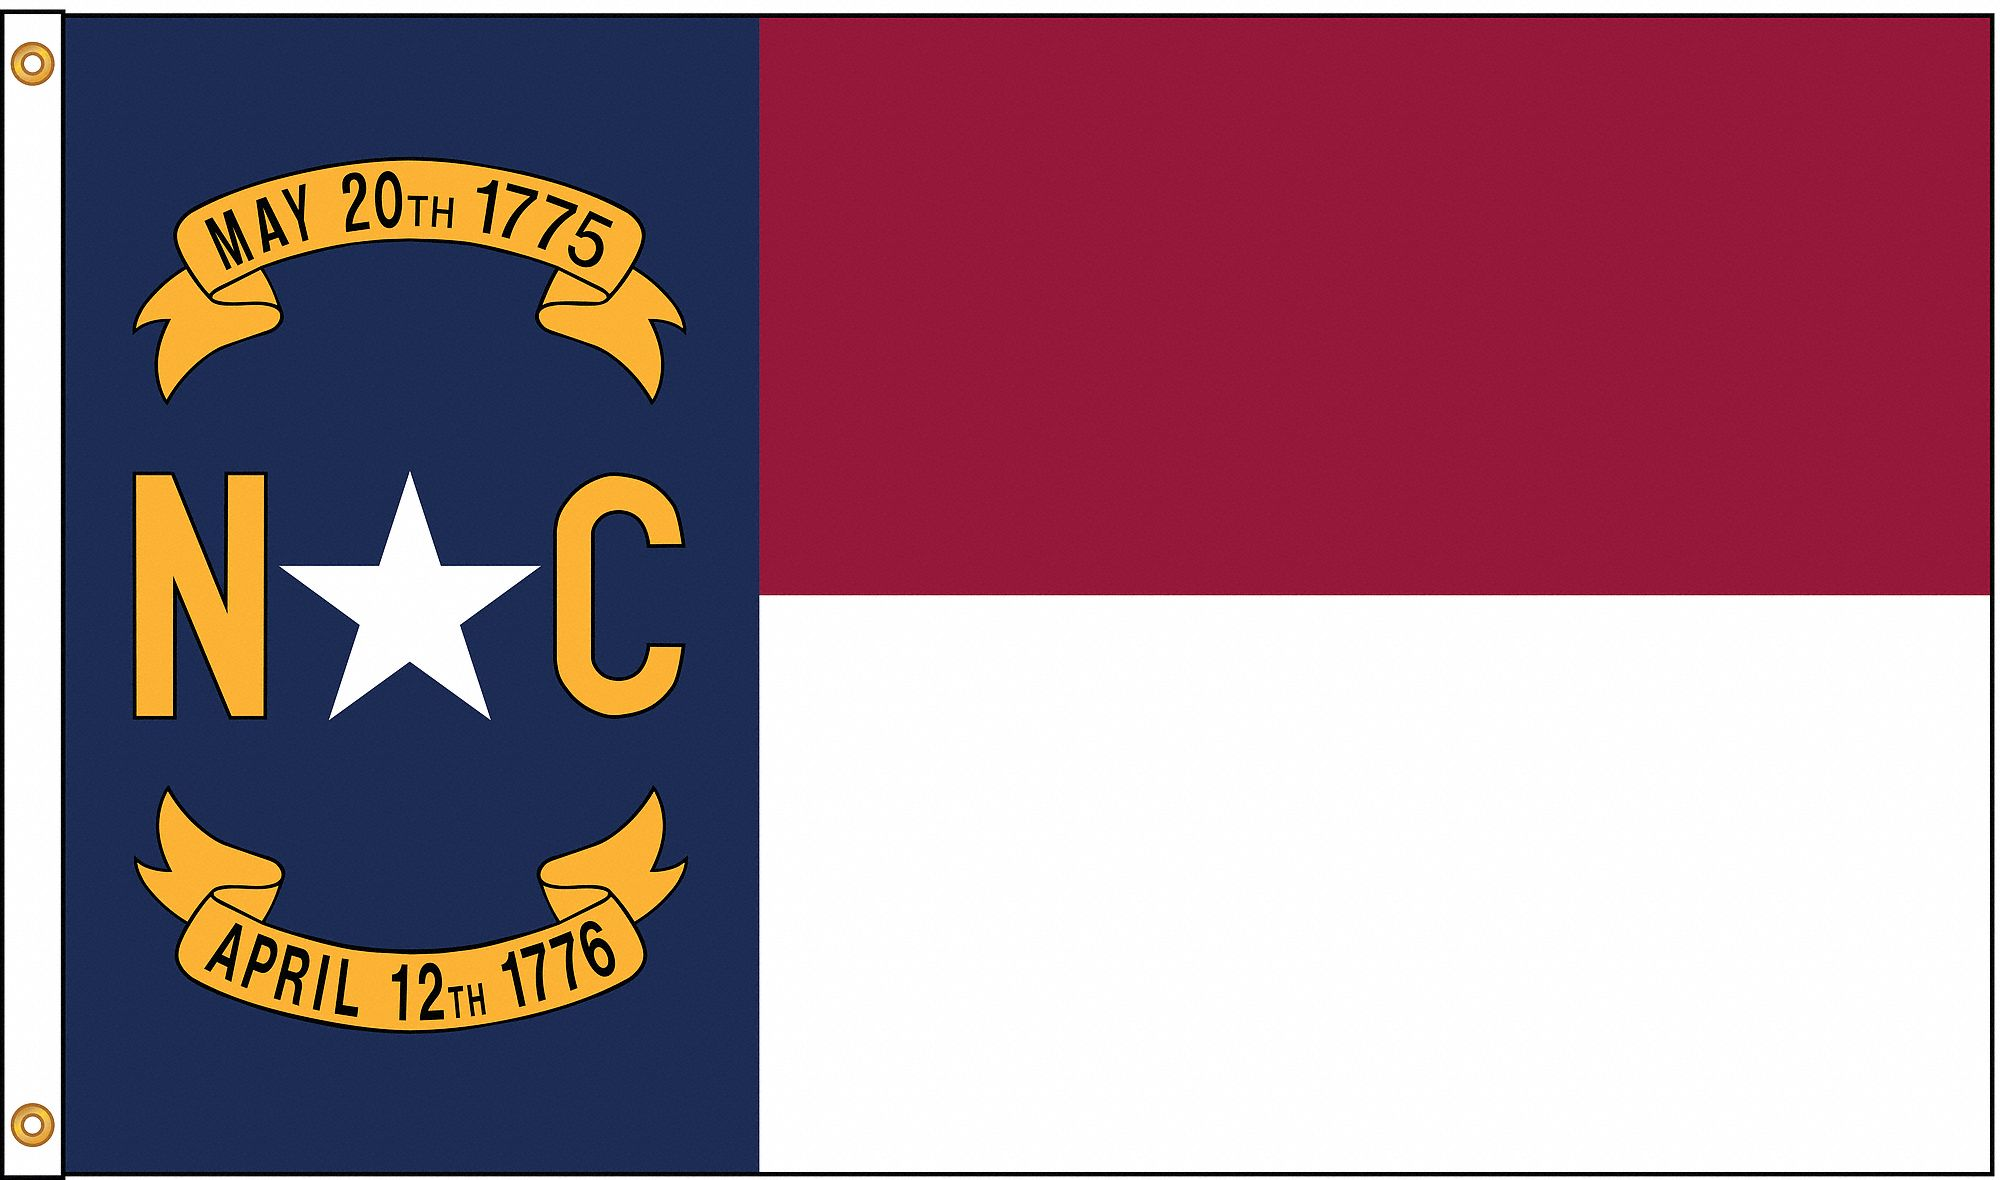 NYLGLO North Carolina State Flag 4 FtH X 6 FtW Indoor